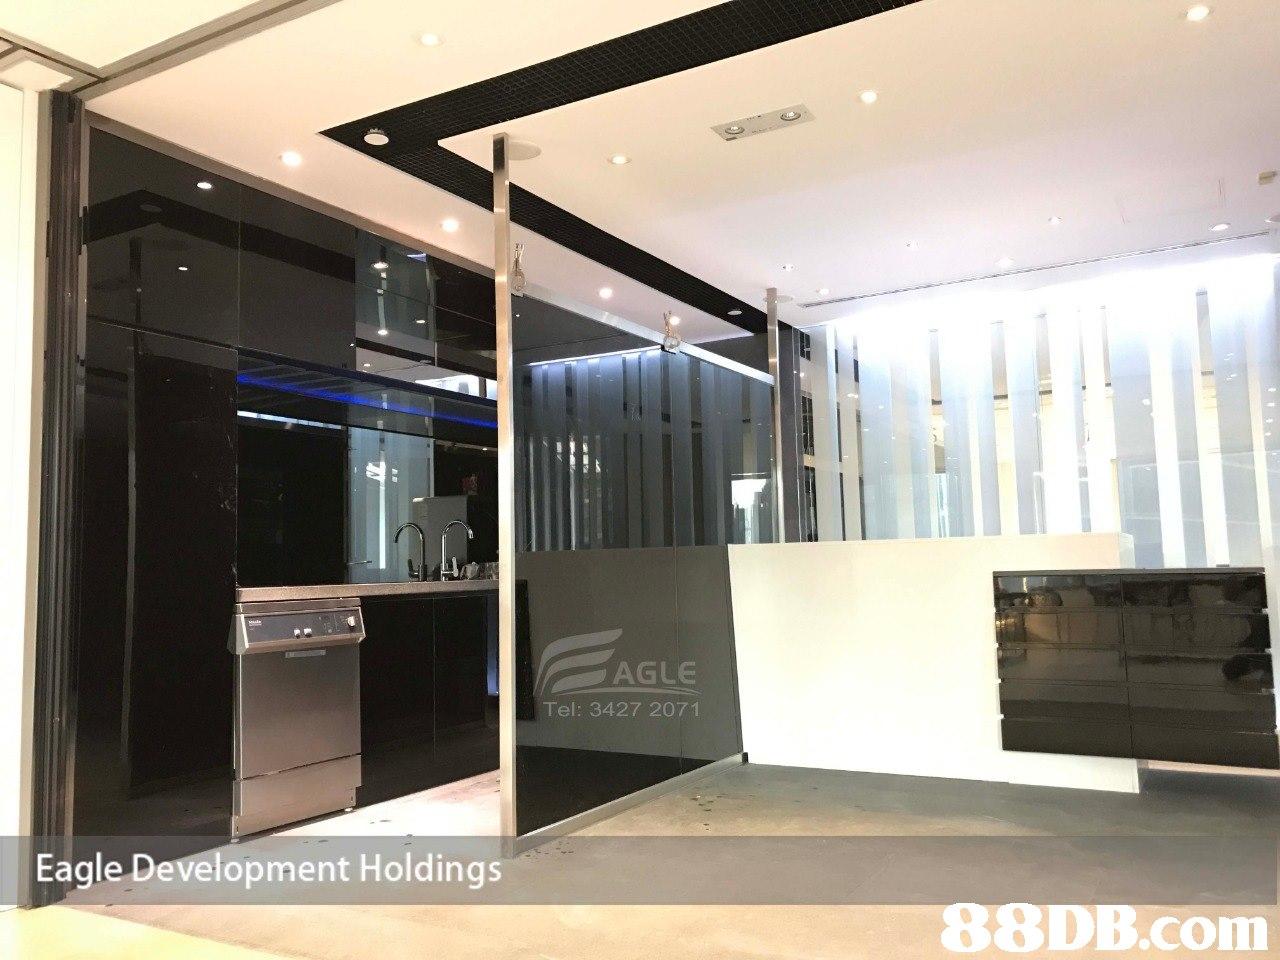 AGLE Tel: 3427 2071 Eagle Development Holdings   property,interior design,